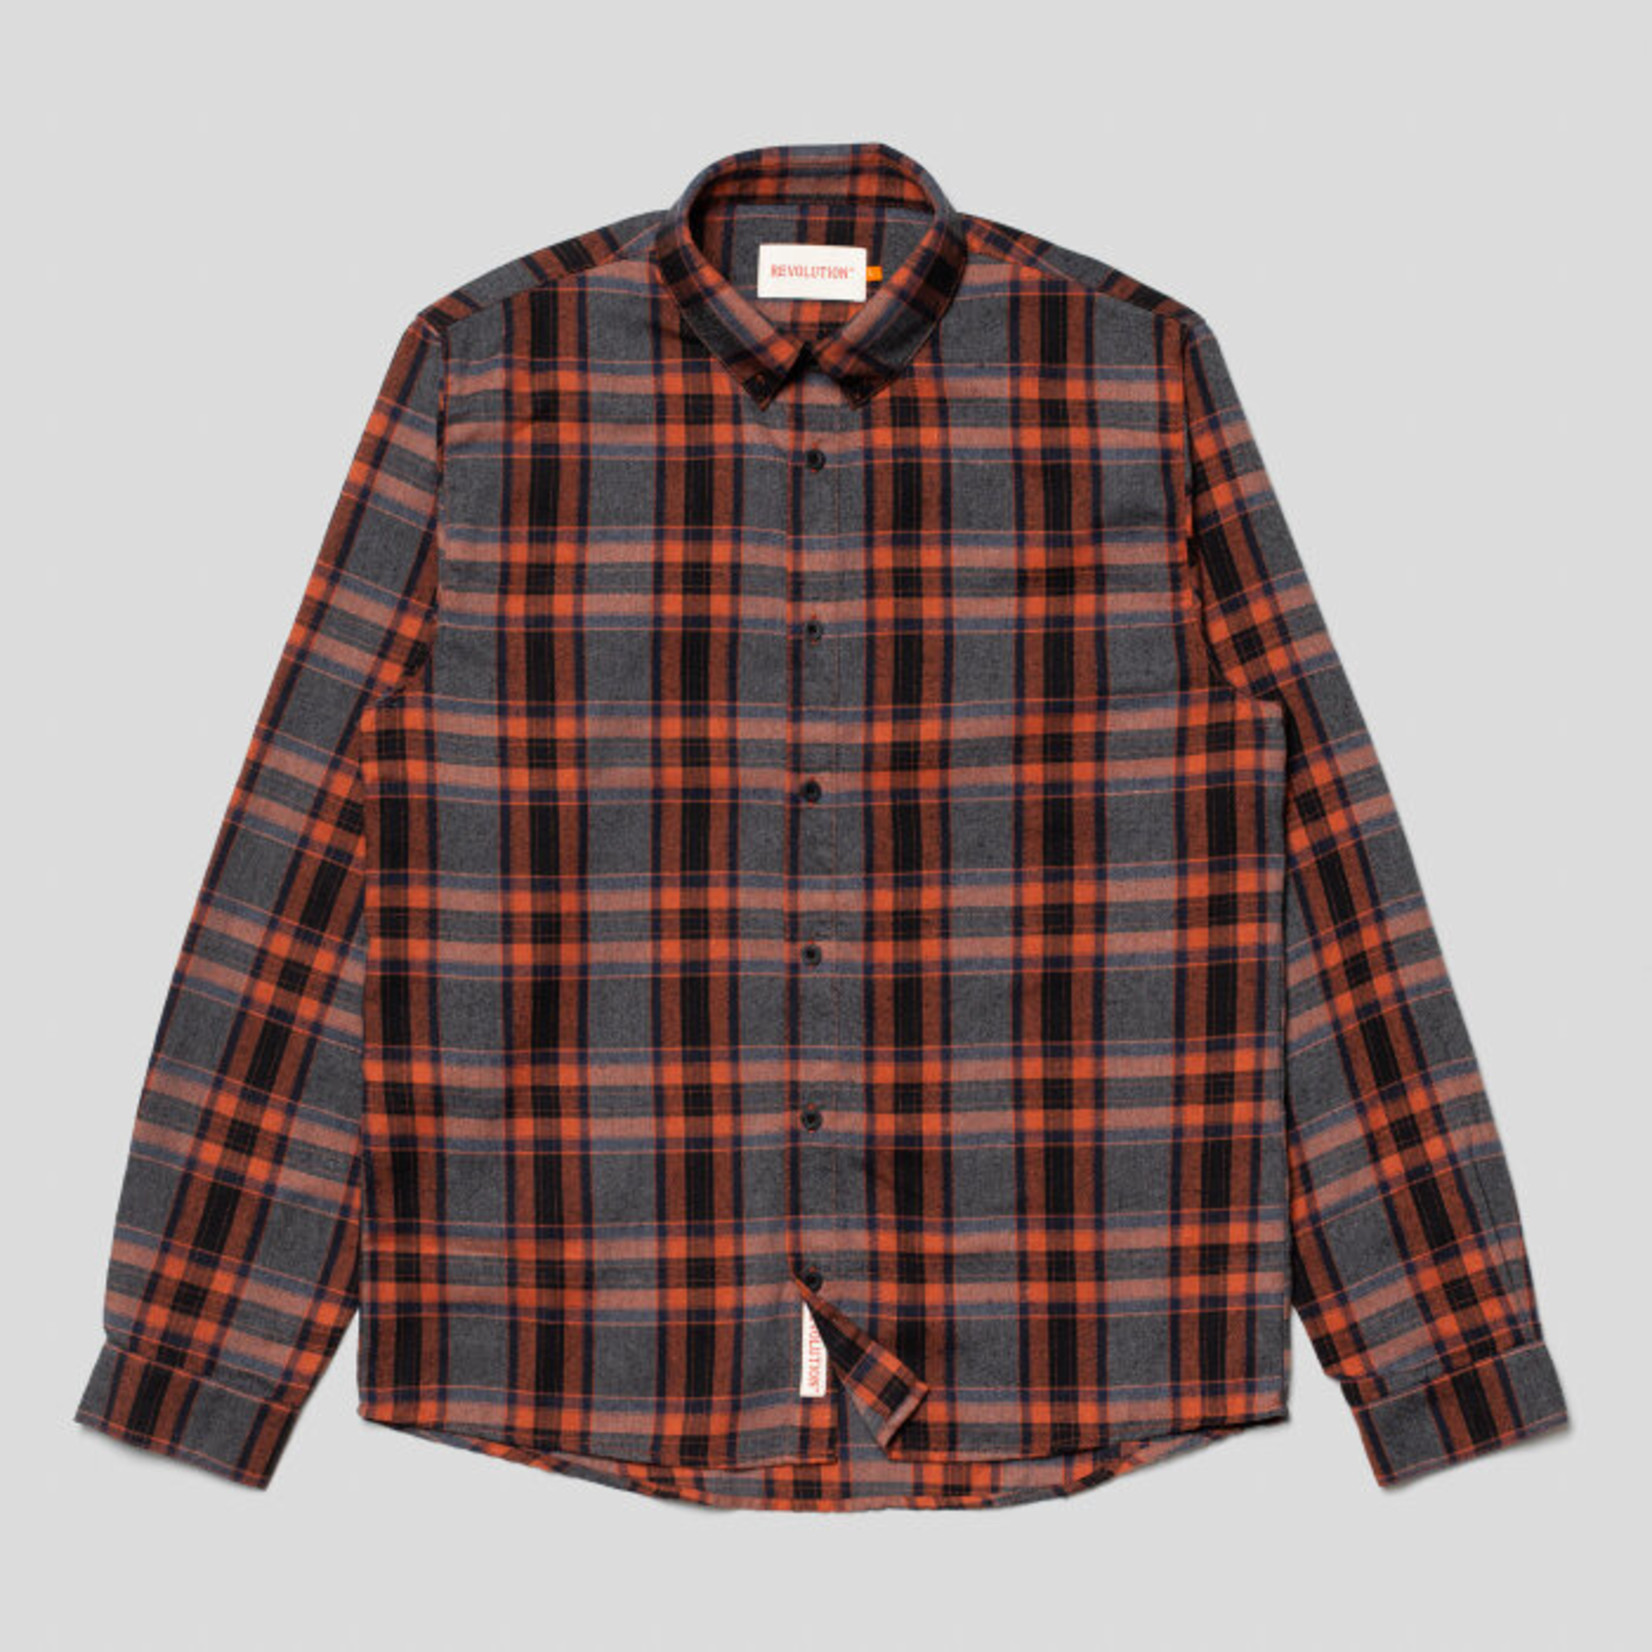 RVLT Revolution Revolution 3829 Button-Down Shirt